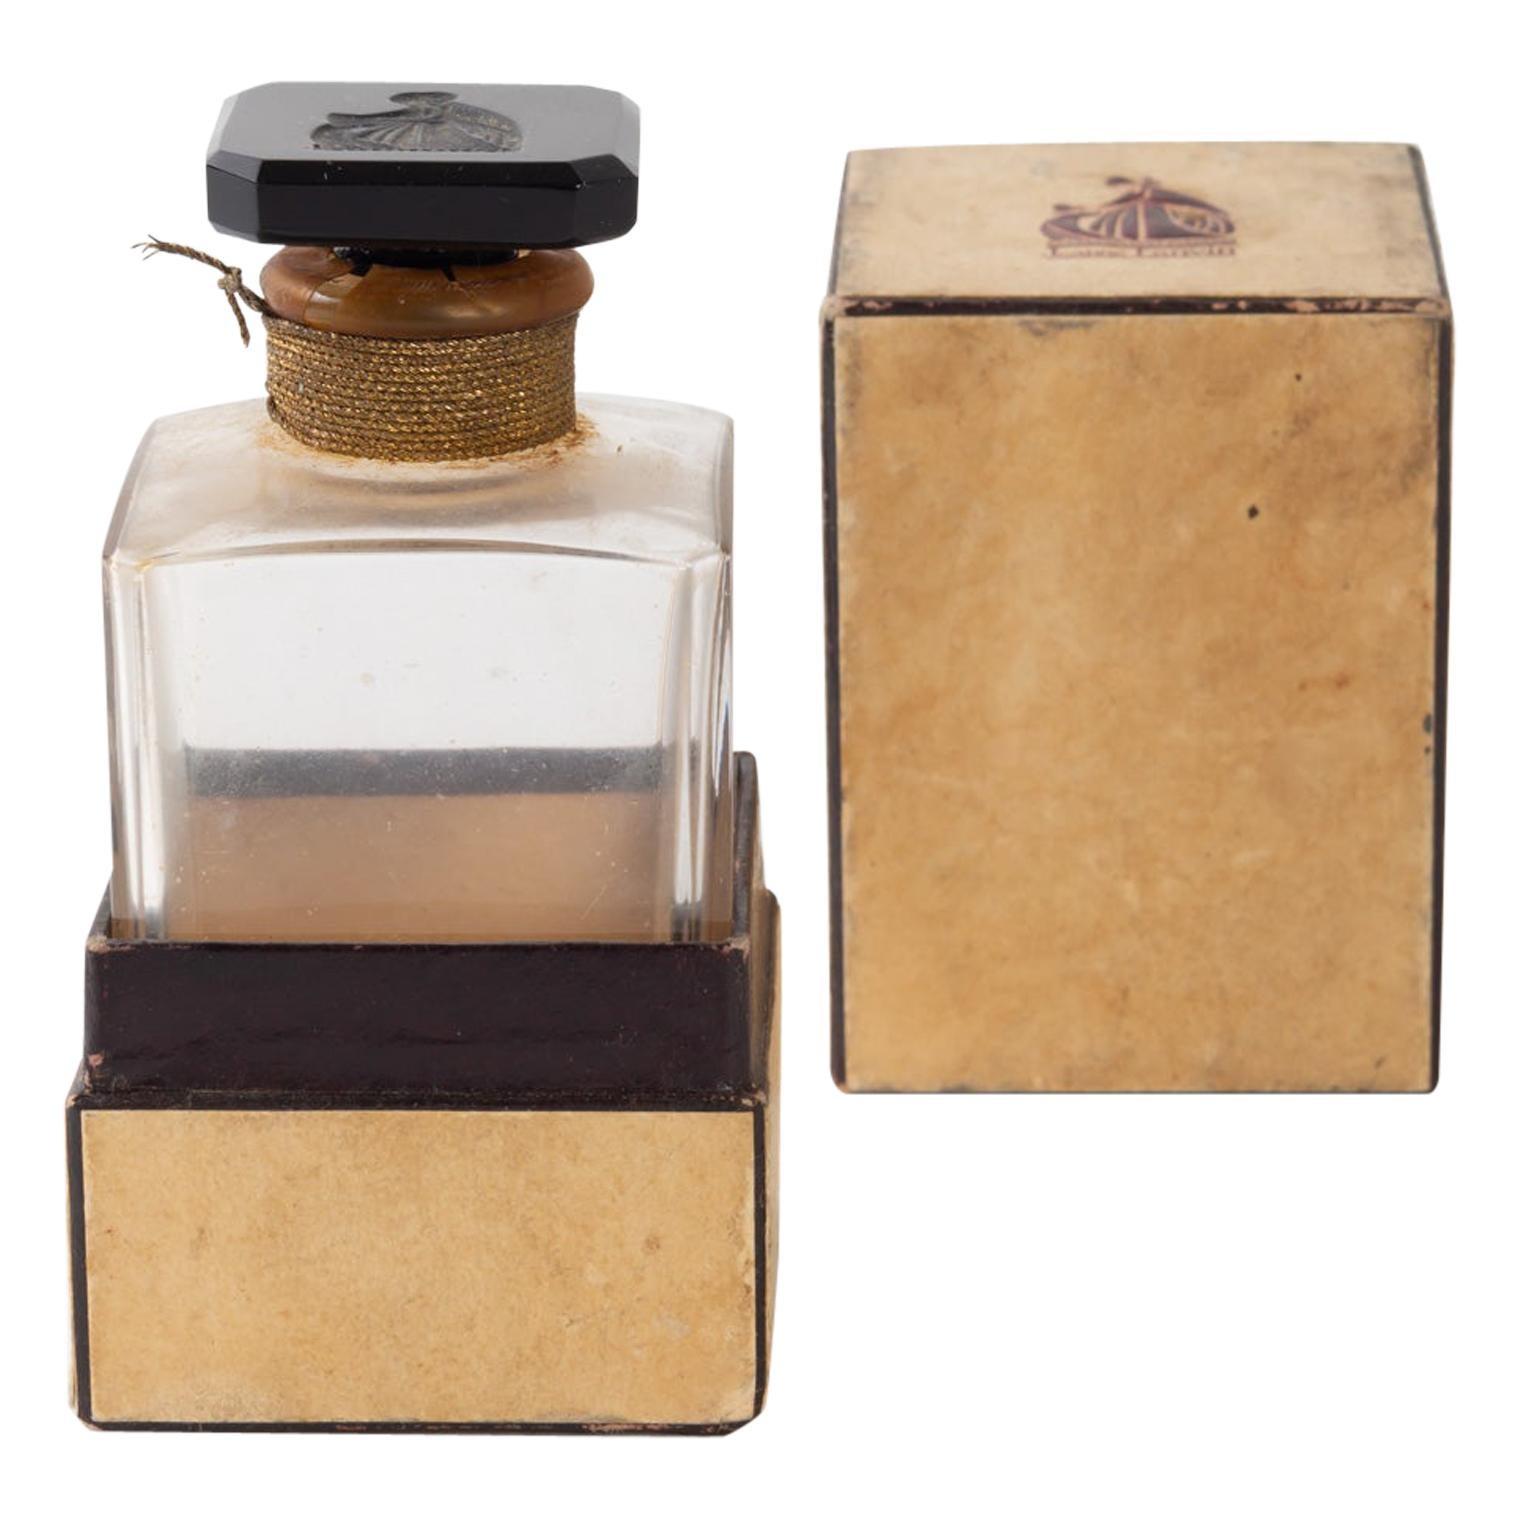 Lanvin Perfume Bottle